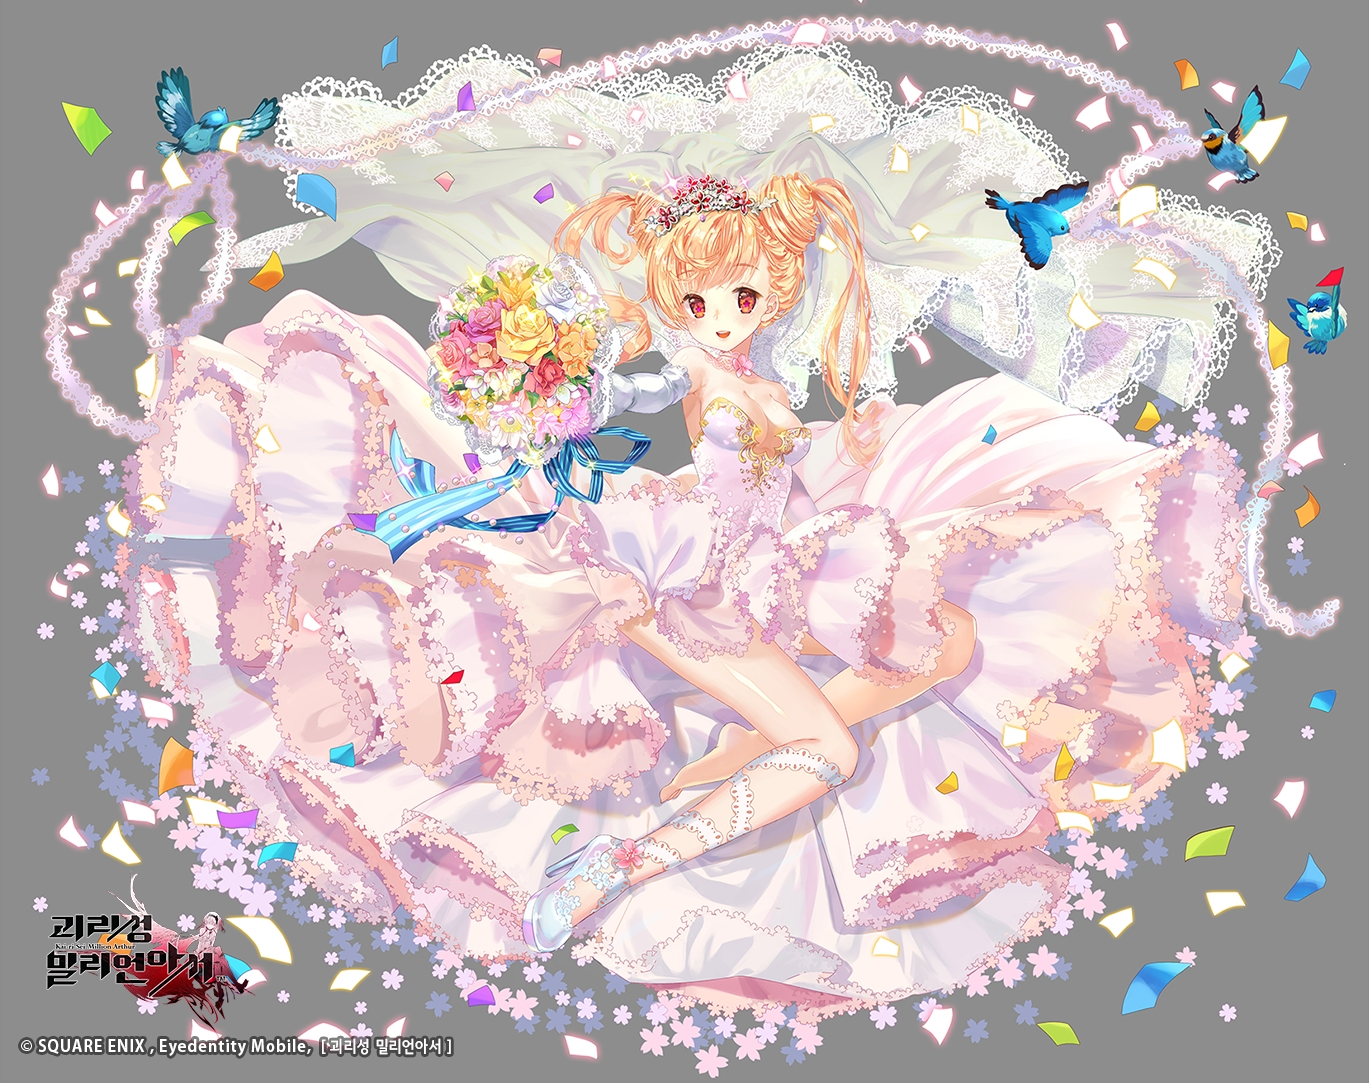 animal bird blonde_hair bow dress flowers kaku-san-sei_million_arthur mintchoco red_eyes ribbons watermark wedding_attire